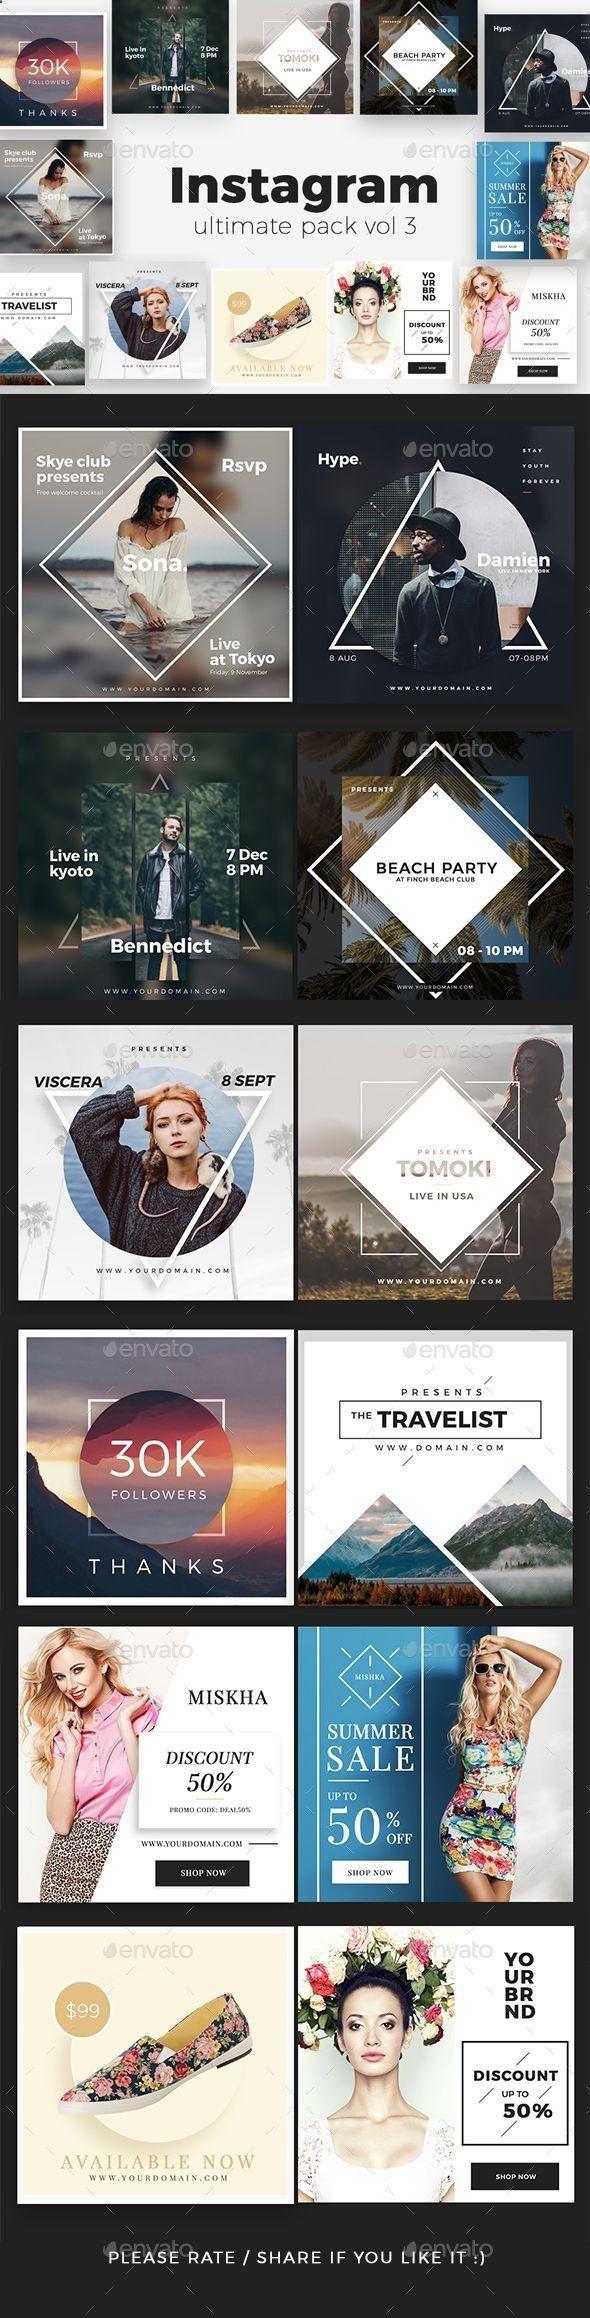 Instagram Ultimate Pack Vol 3 - Social Media Web Elements